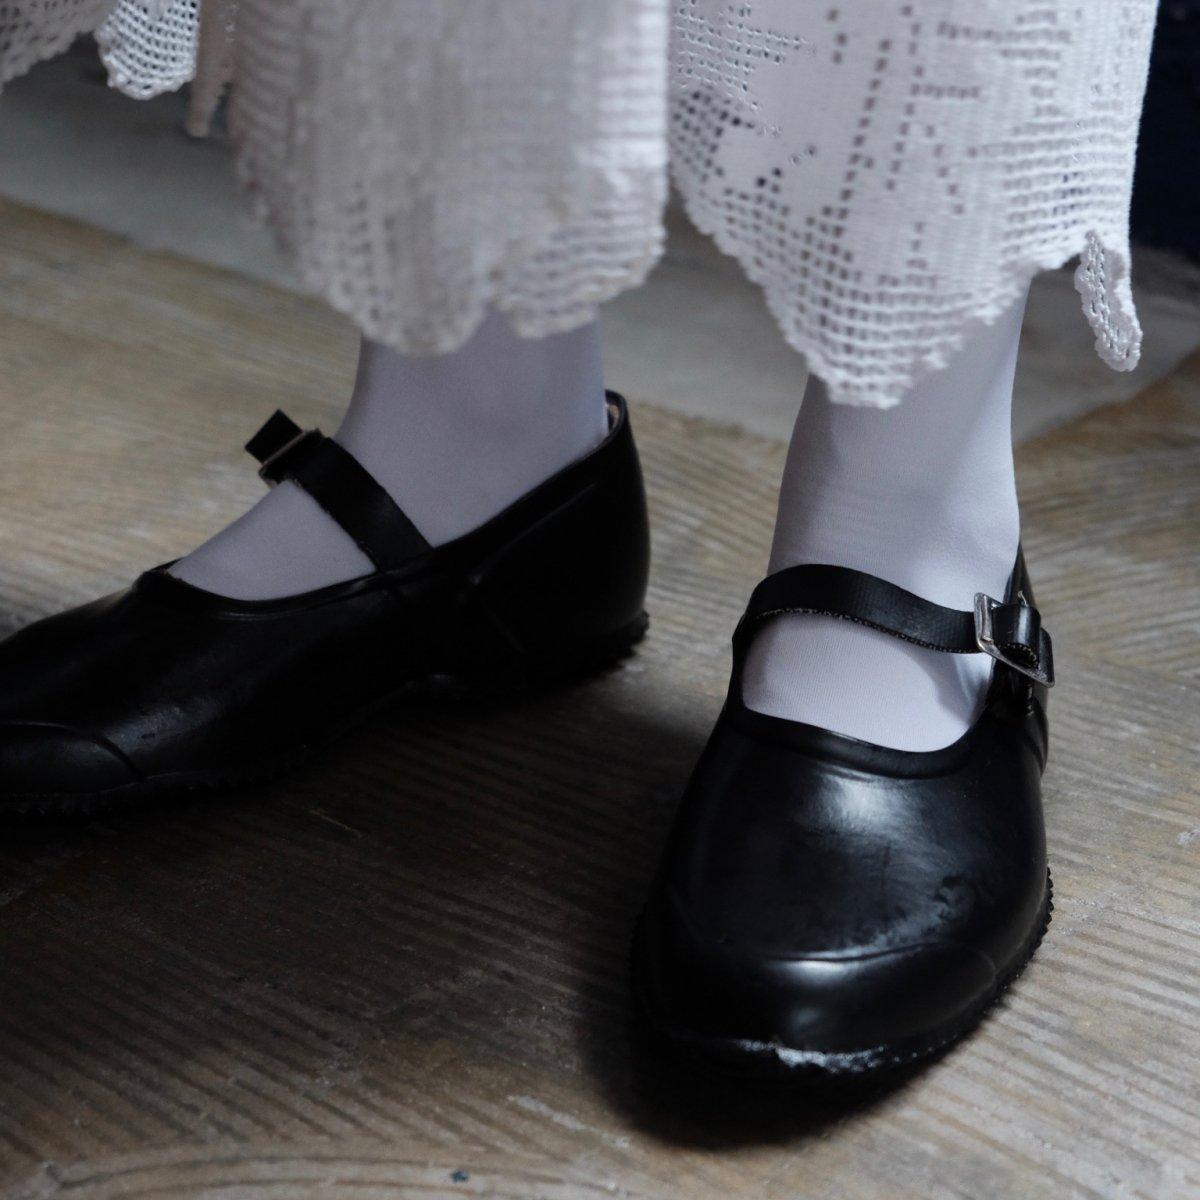 Strap Rubber Shoes BLACK by OPANAK